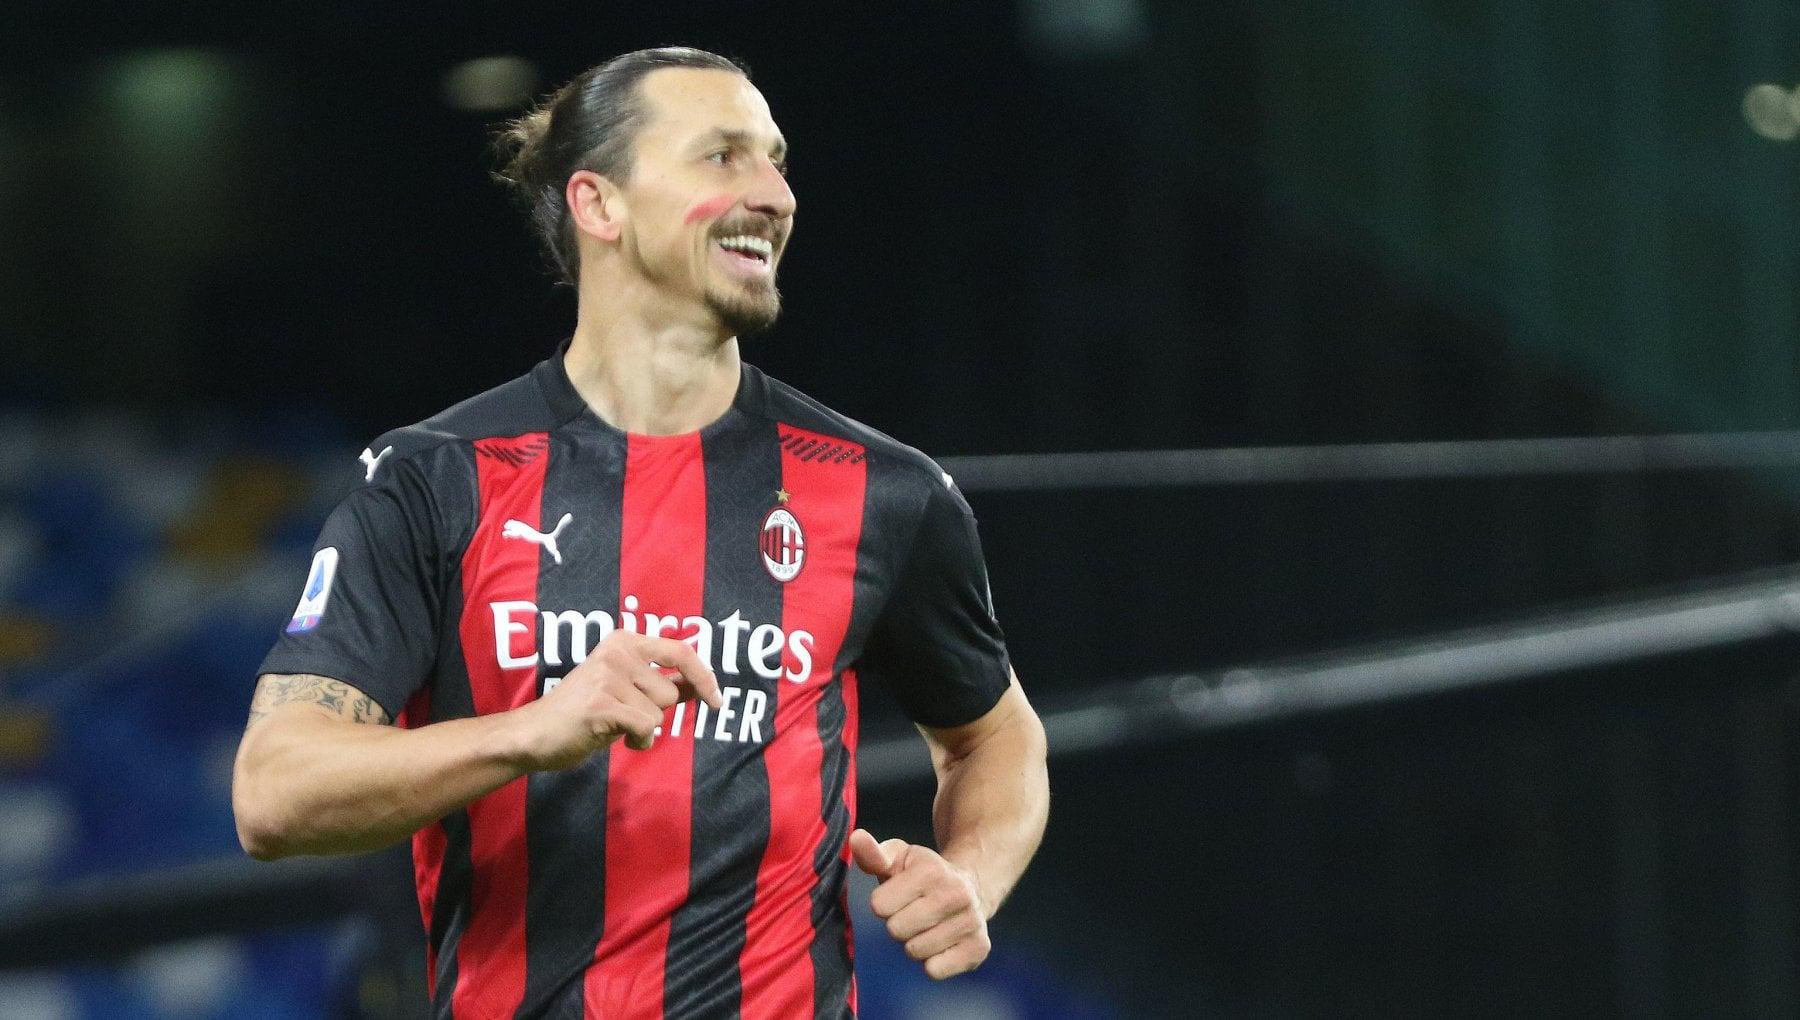 Napoli Milan 1 3 Ibrahimovic vince la sfida con Gattuso agli azzurri resta lorgoglio